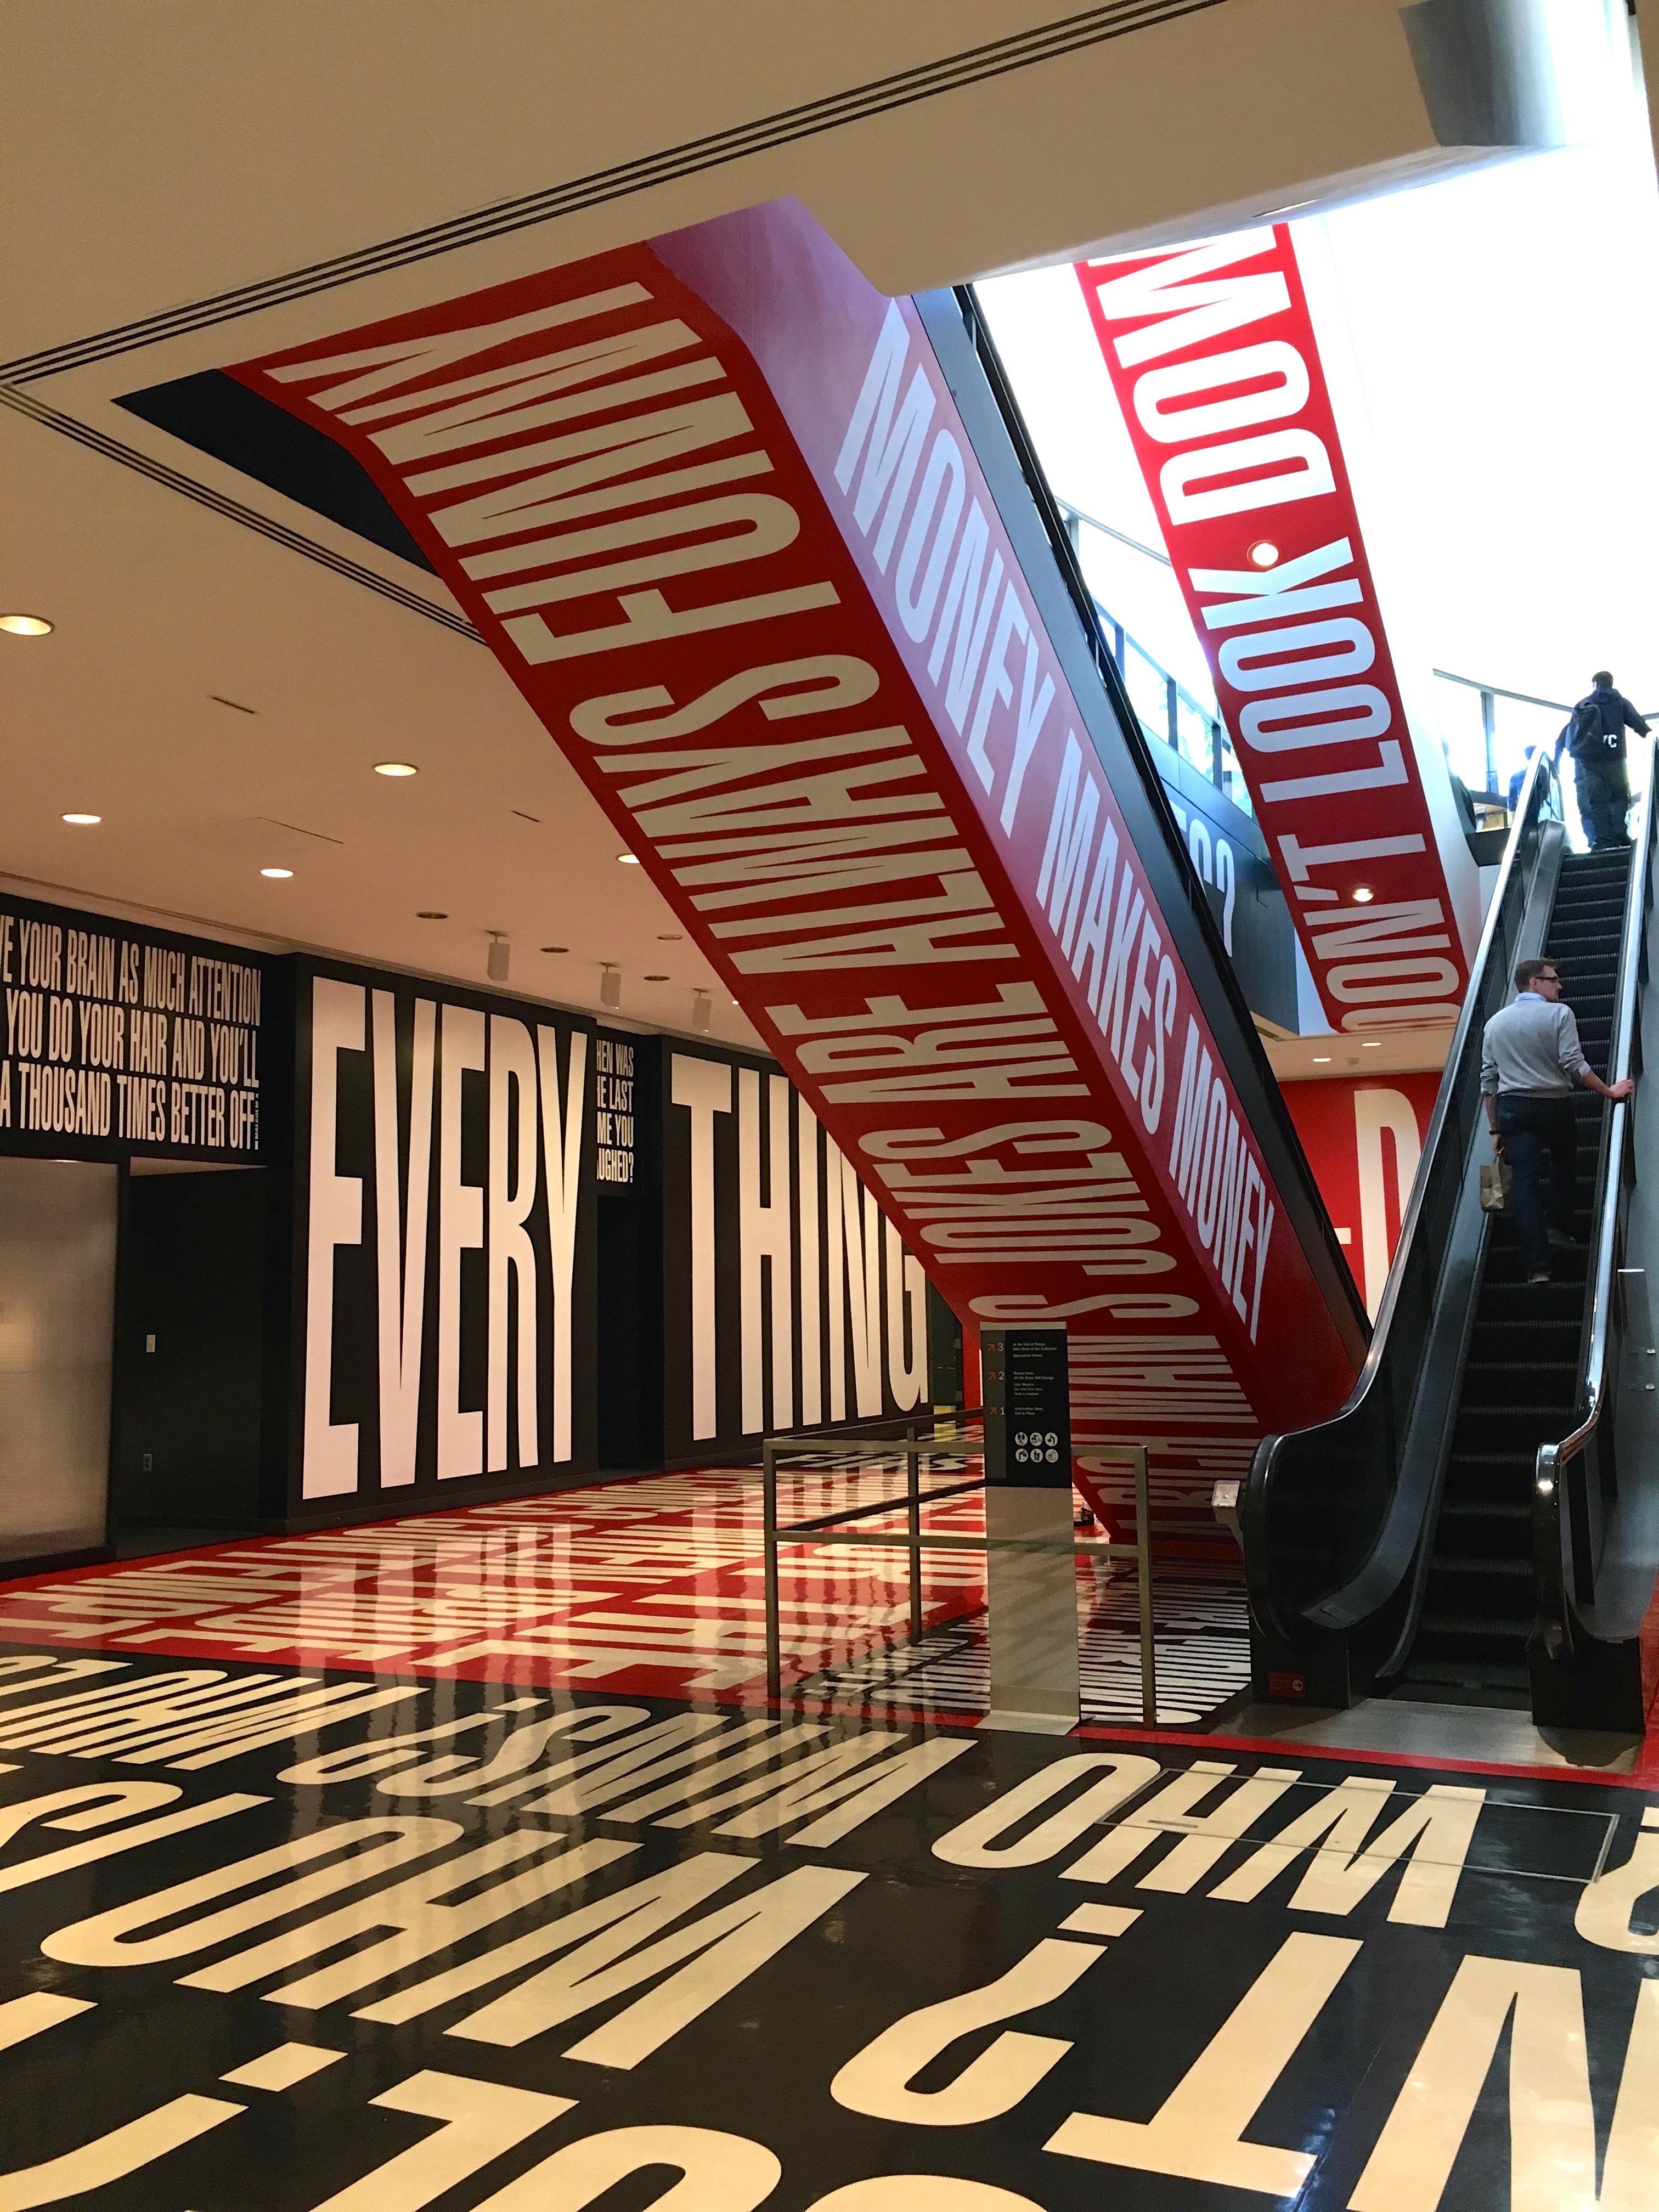 Hirshhorn Museum in DC. PC: Naomi Folta